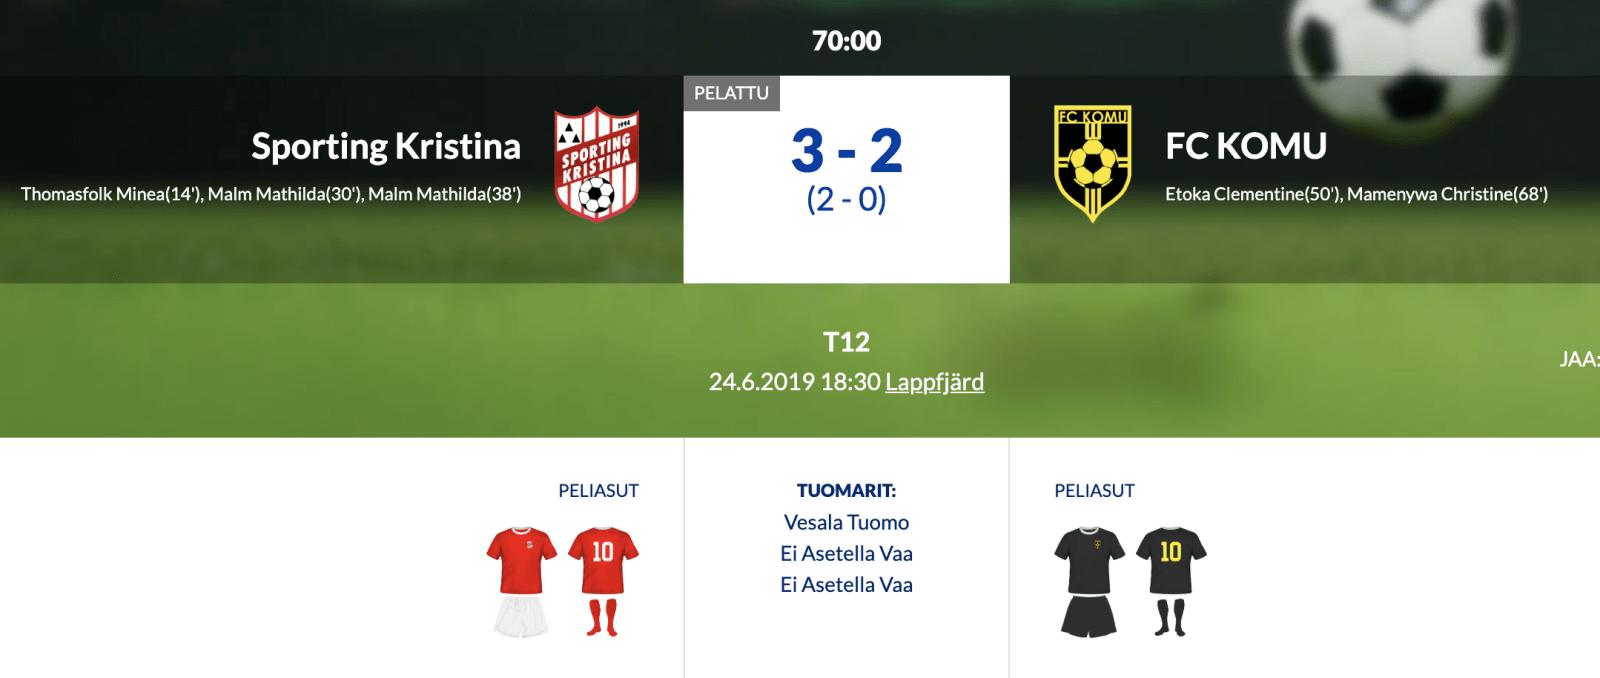 F12 Sporting Kristina – FC KOMU 3-2 (2-0)